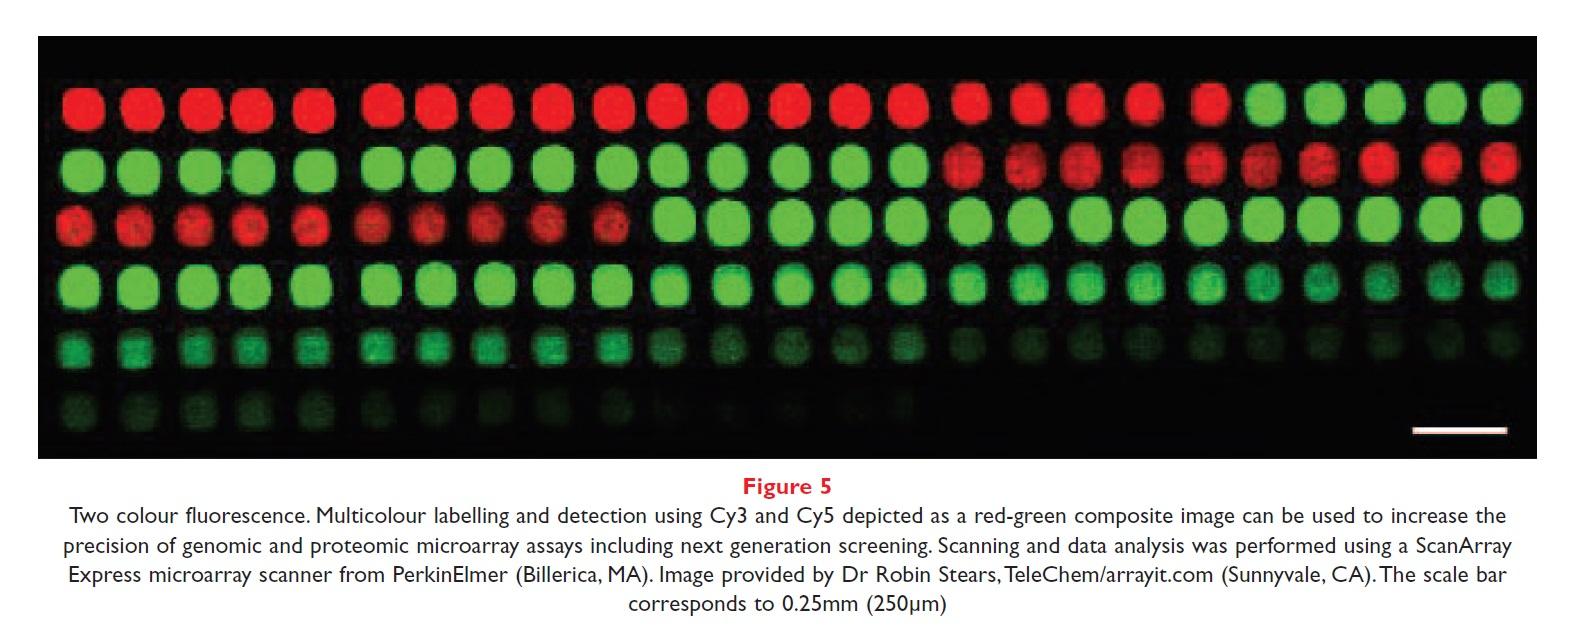 Figure 5 Two colour fluorescence